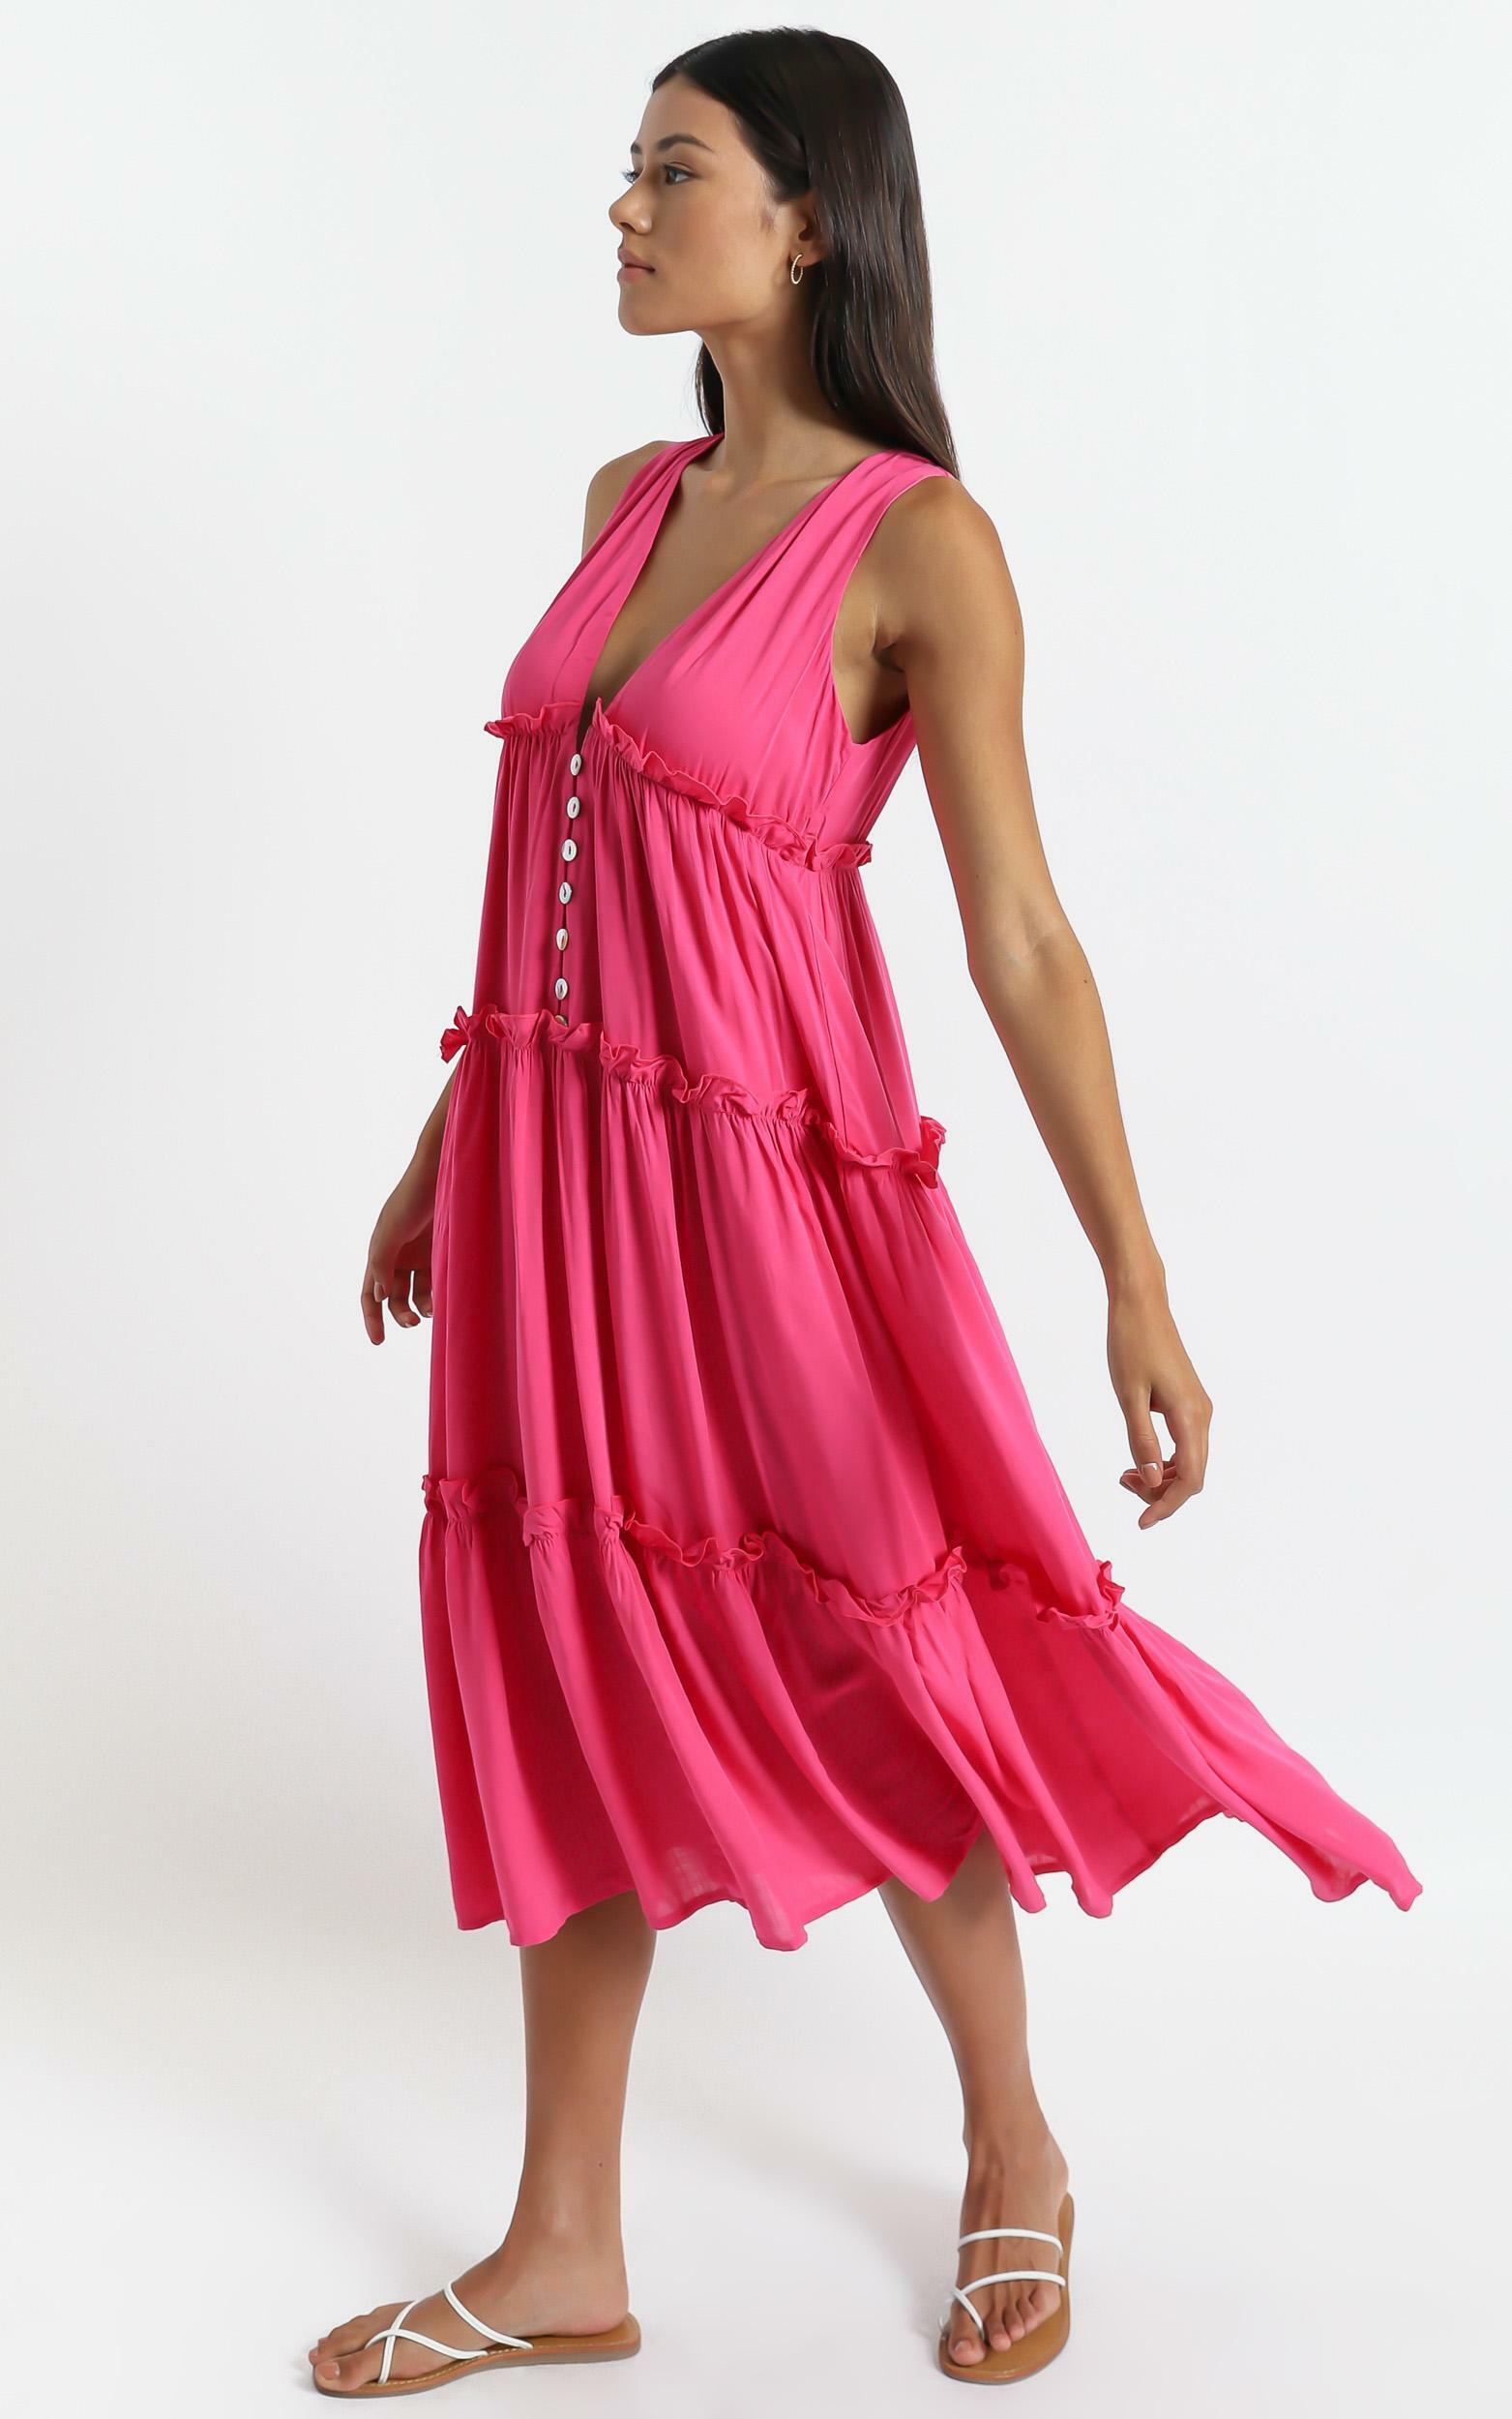 Arlana Dress in Pink - 6 (XS), Pink, hi-res image number null